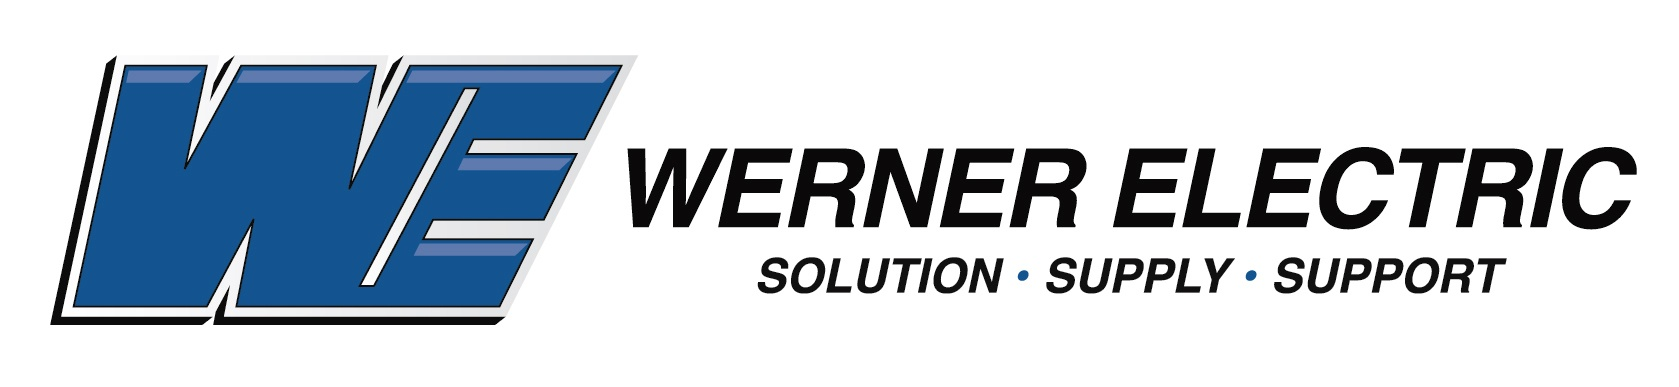 WernerElectric_Inline_PMS288